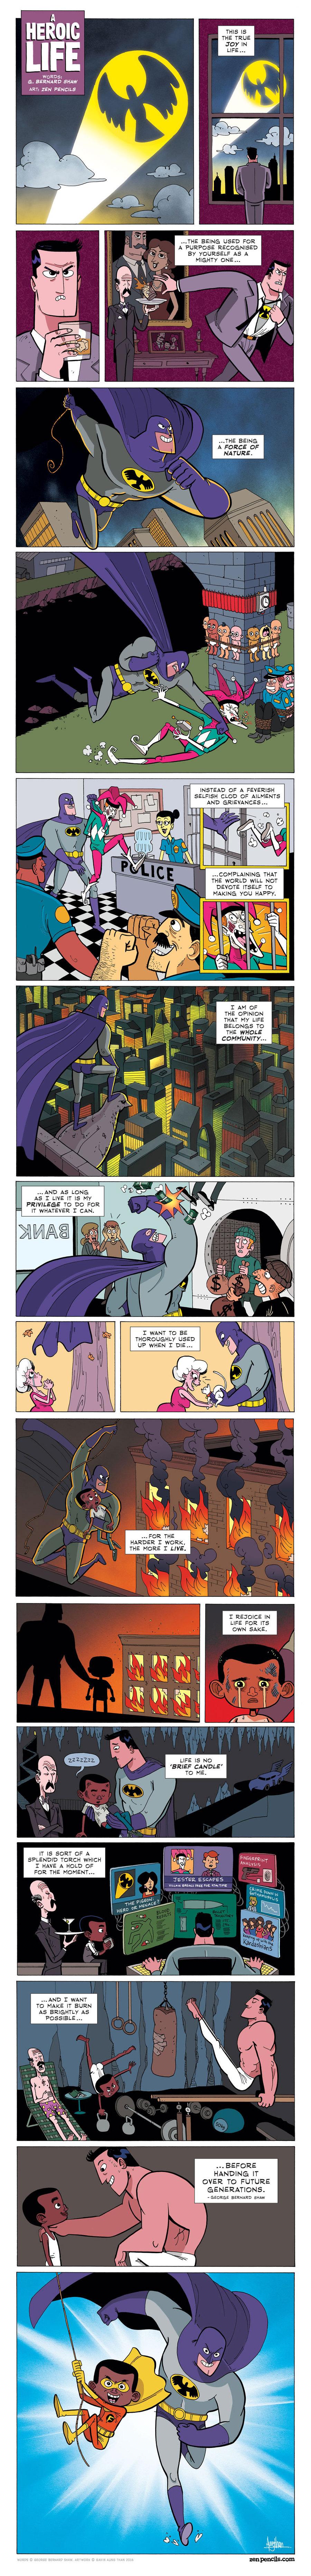 Zen Pencils Comic Strip for January 21, 2019